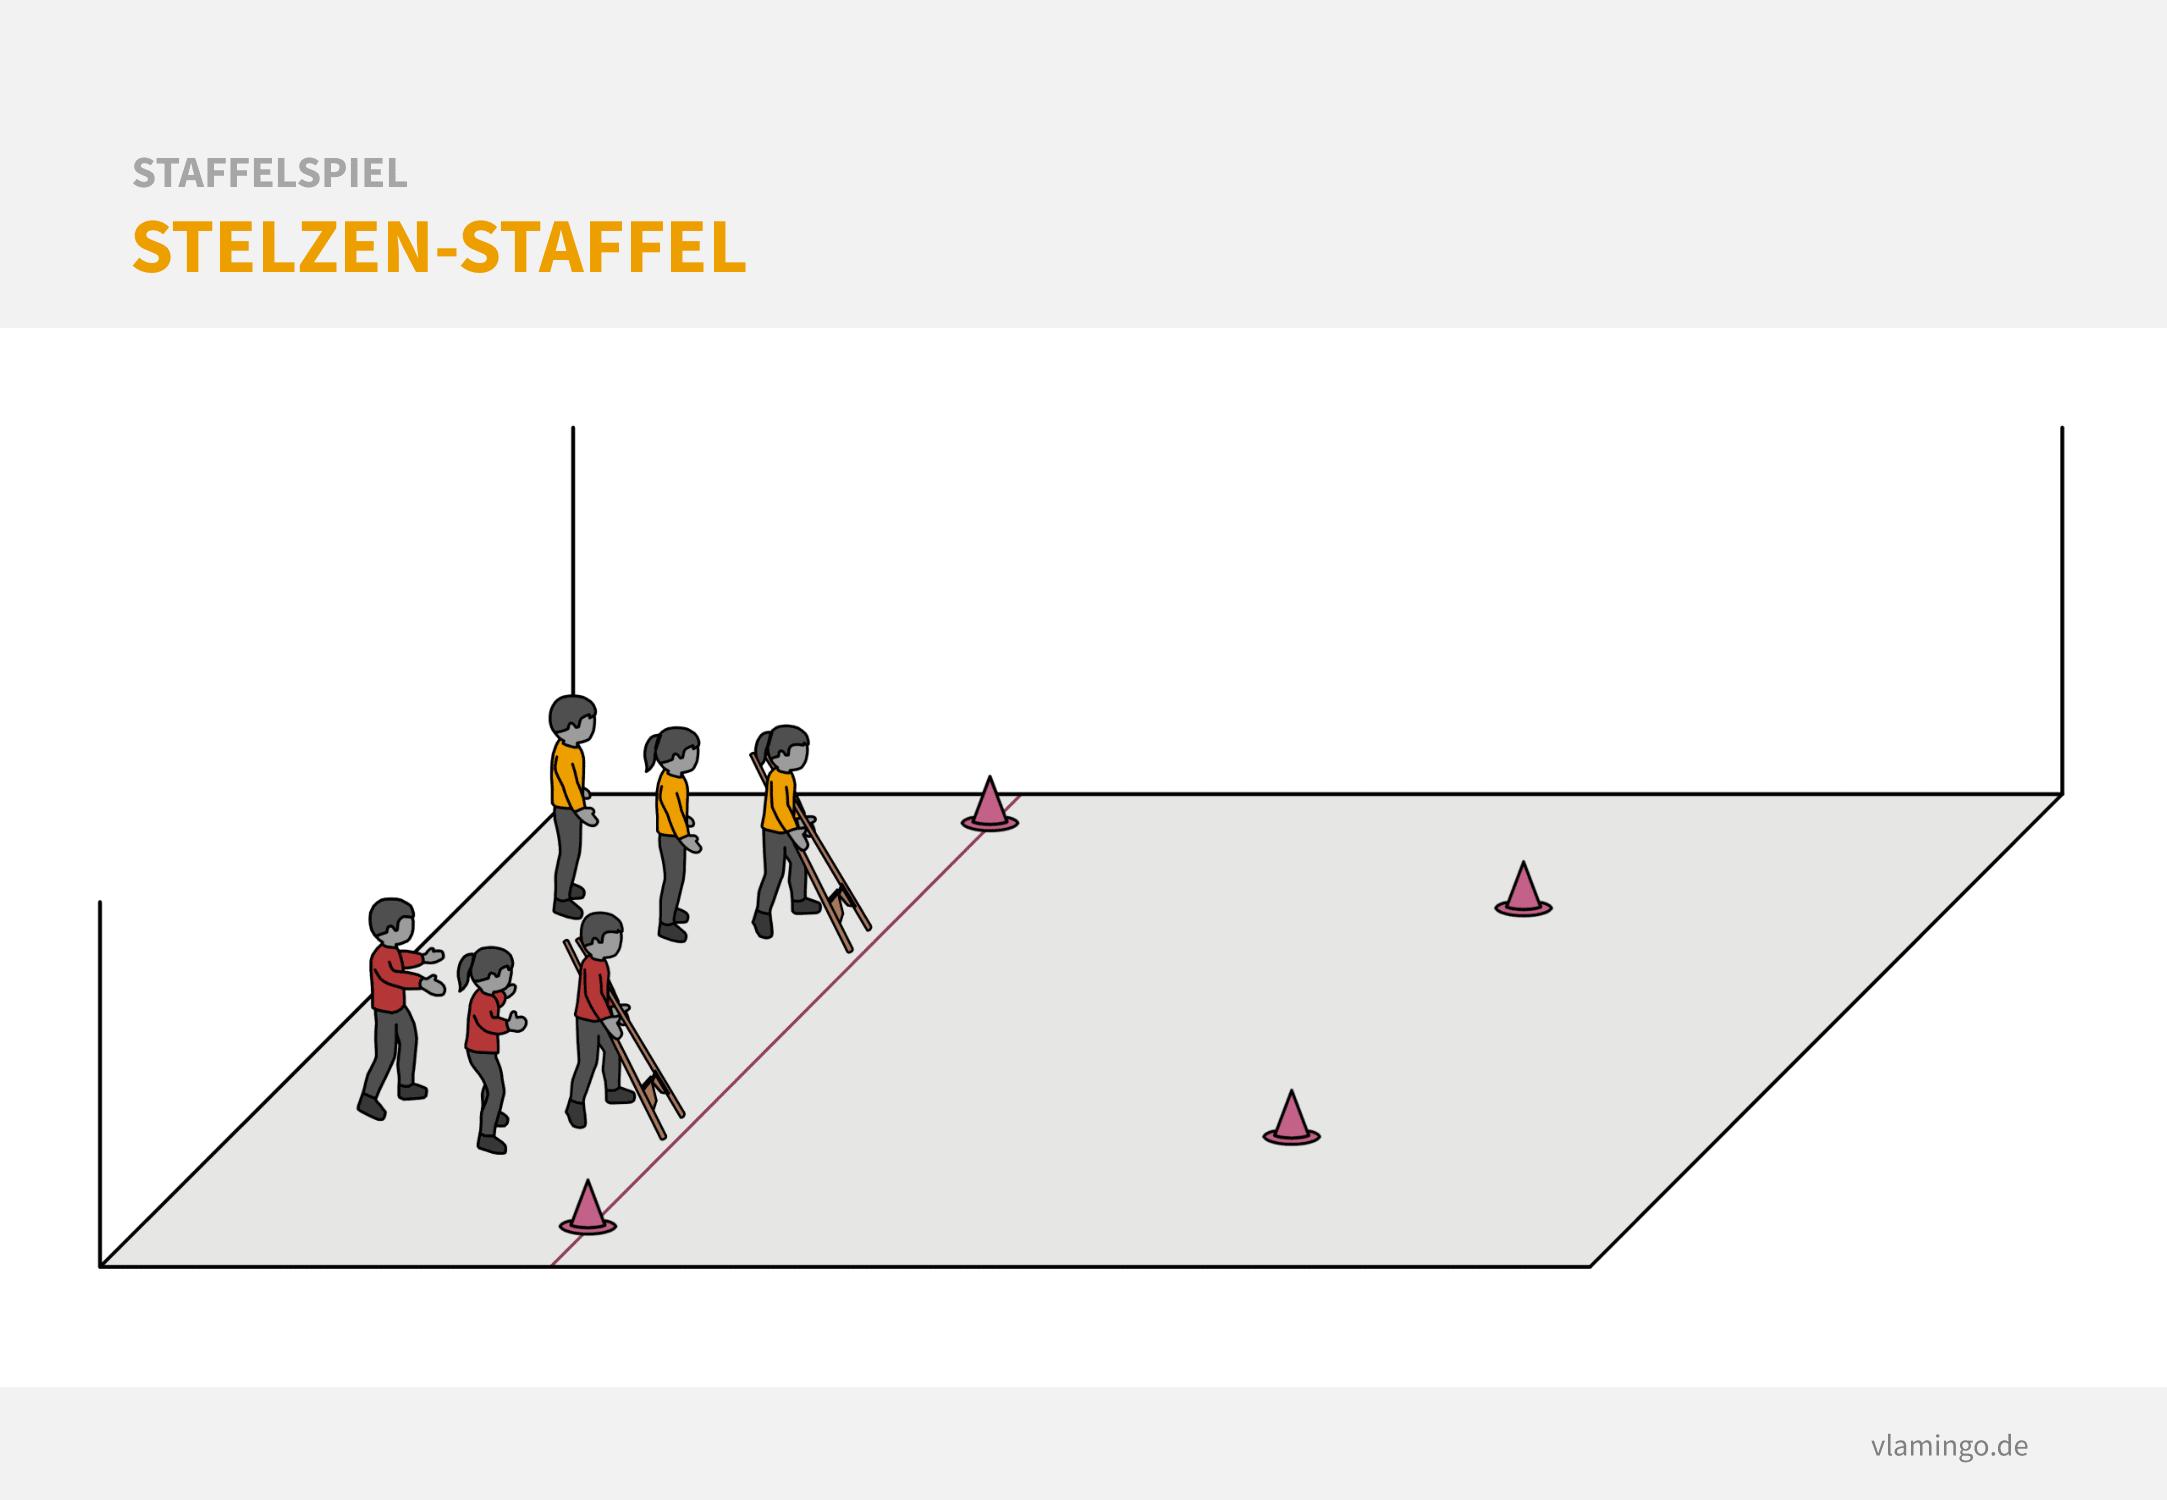 Staffelspiel - Stelzen-Staffel